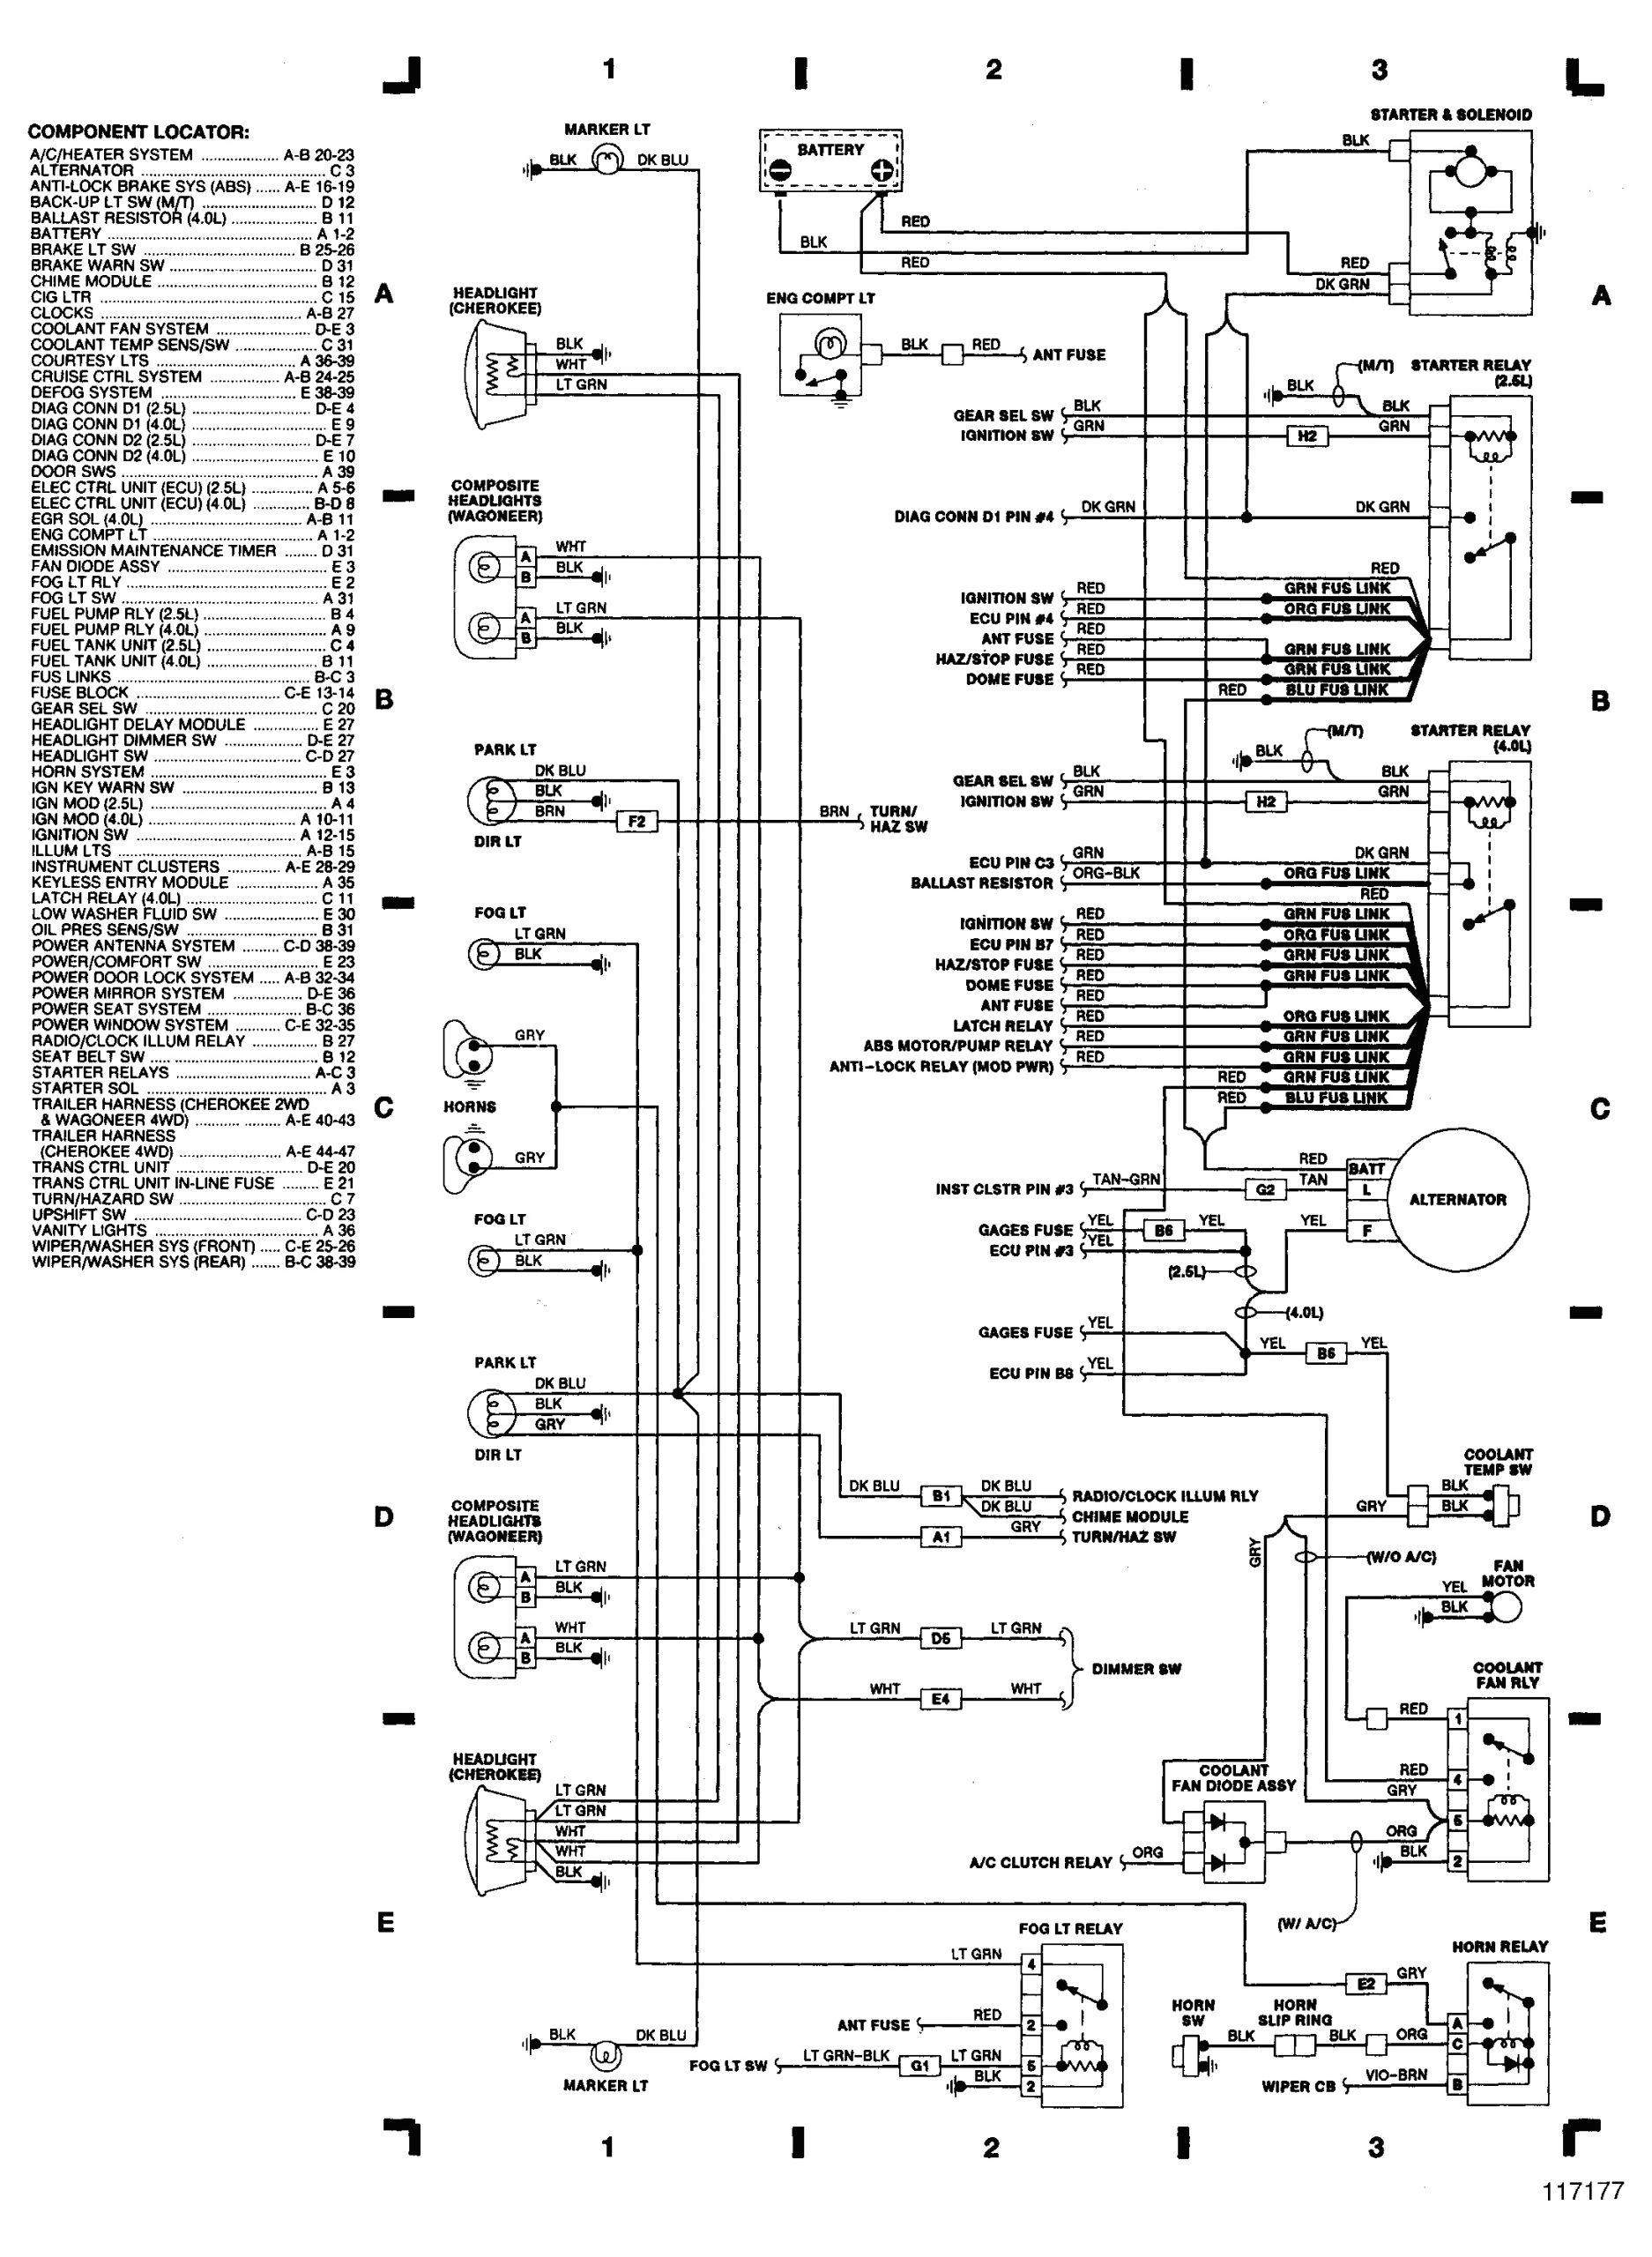 jeep cherokee wiring diagram 1993 rv wiring 2000 jeep wiring diagram operations of jeep cherokee wiring diagram 1993 jpg